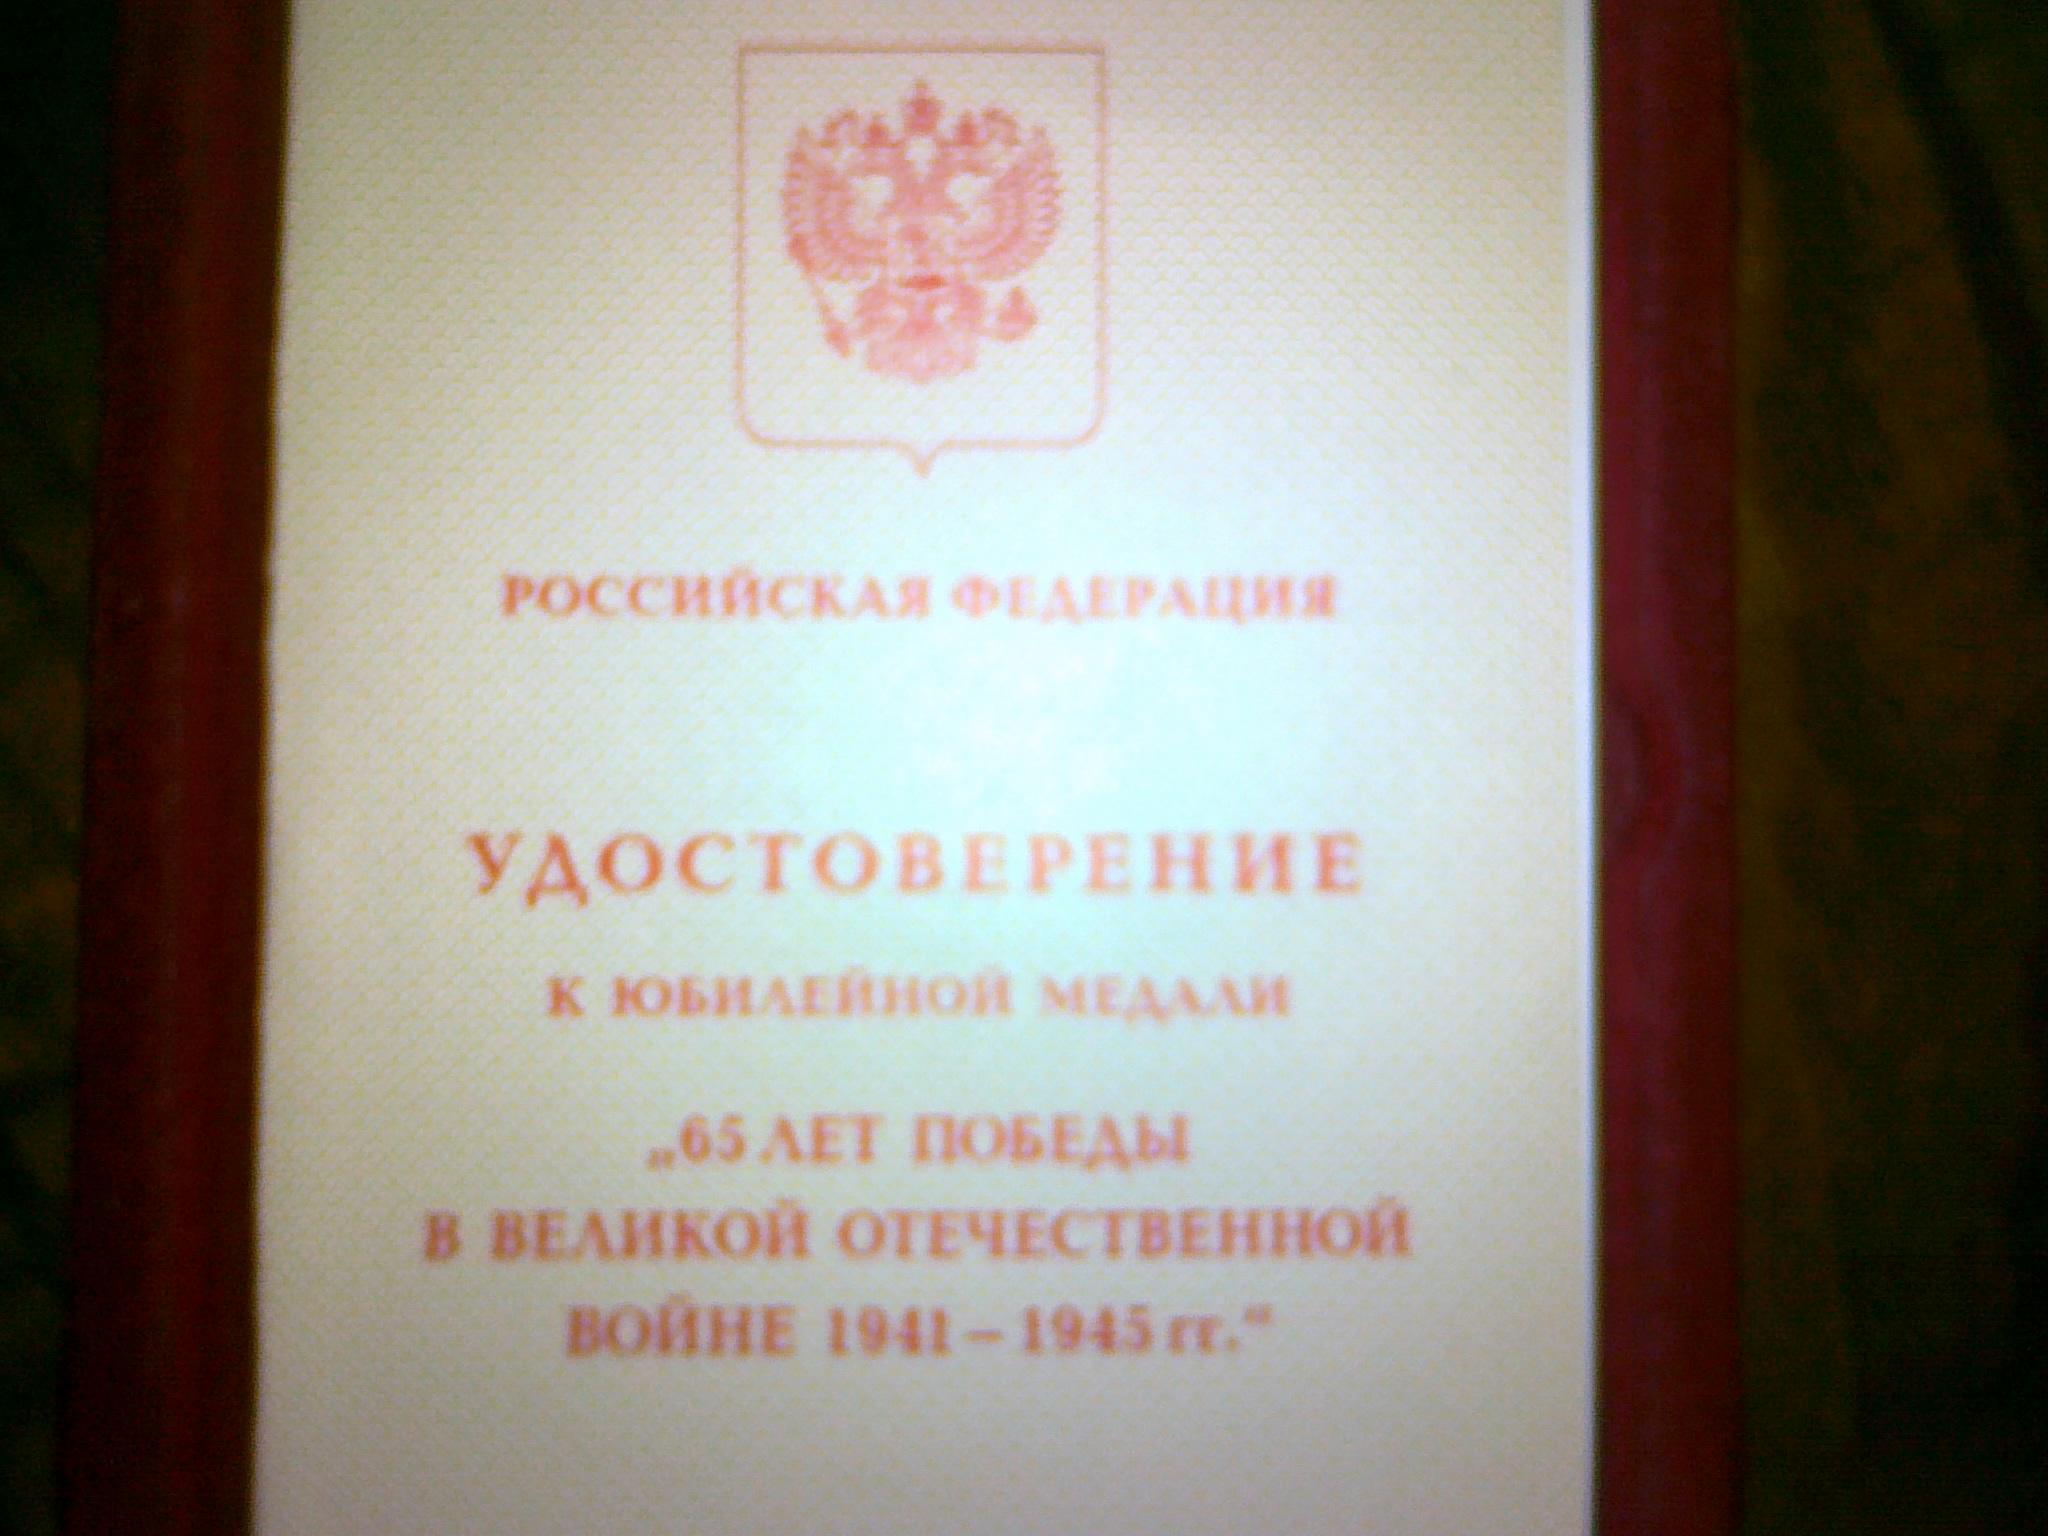 паспортный стол камень на оби: